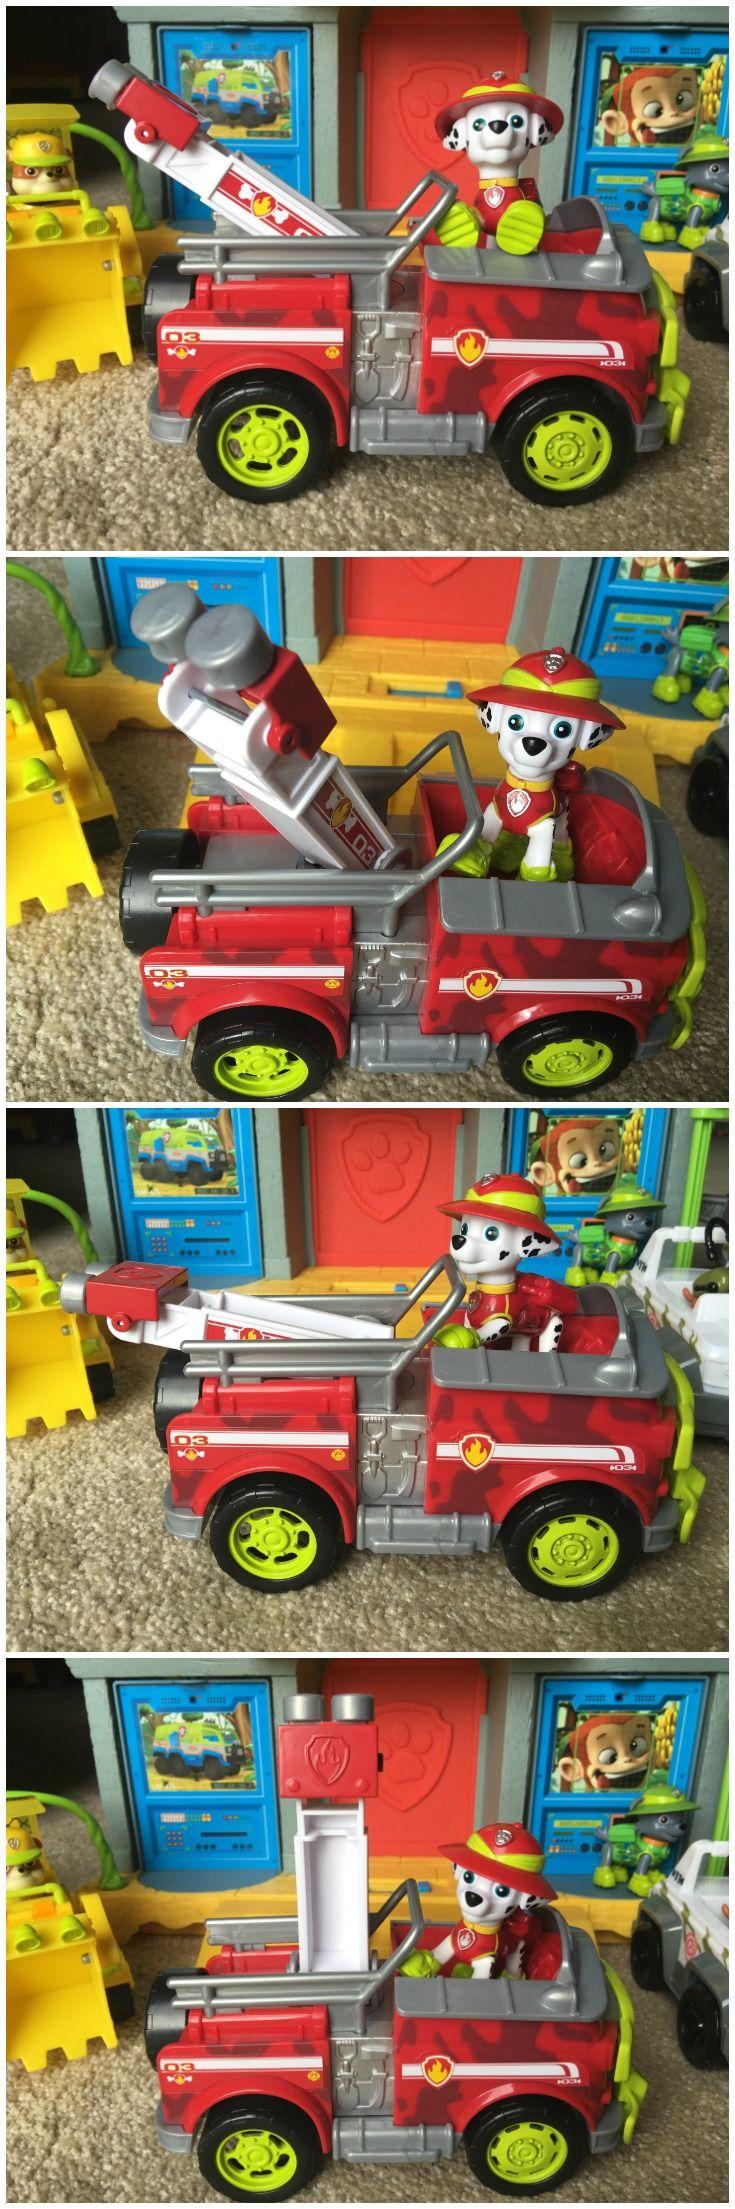 Paw Patrol Jungle Rescue Marshall Toy